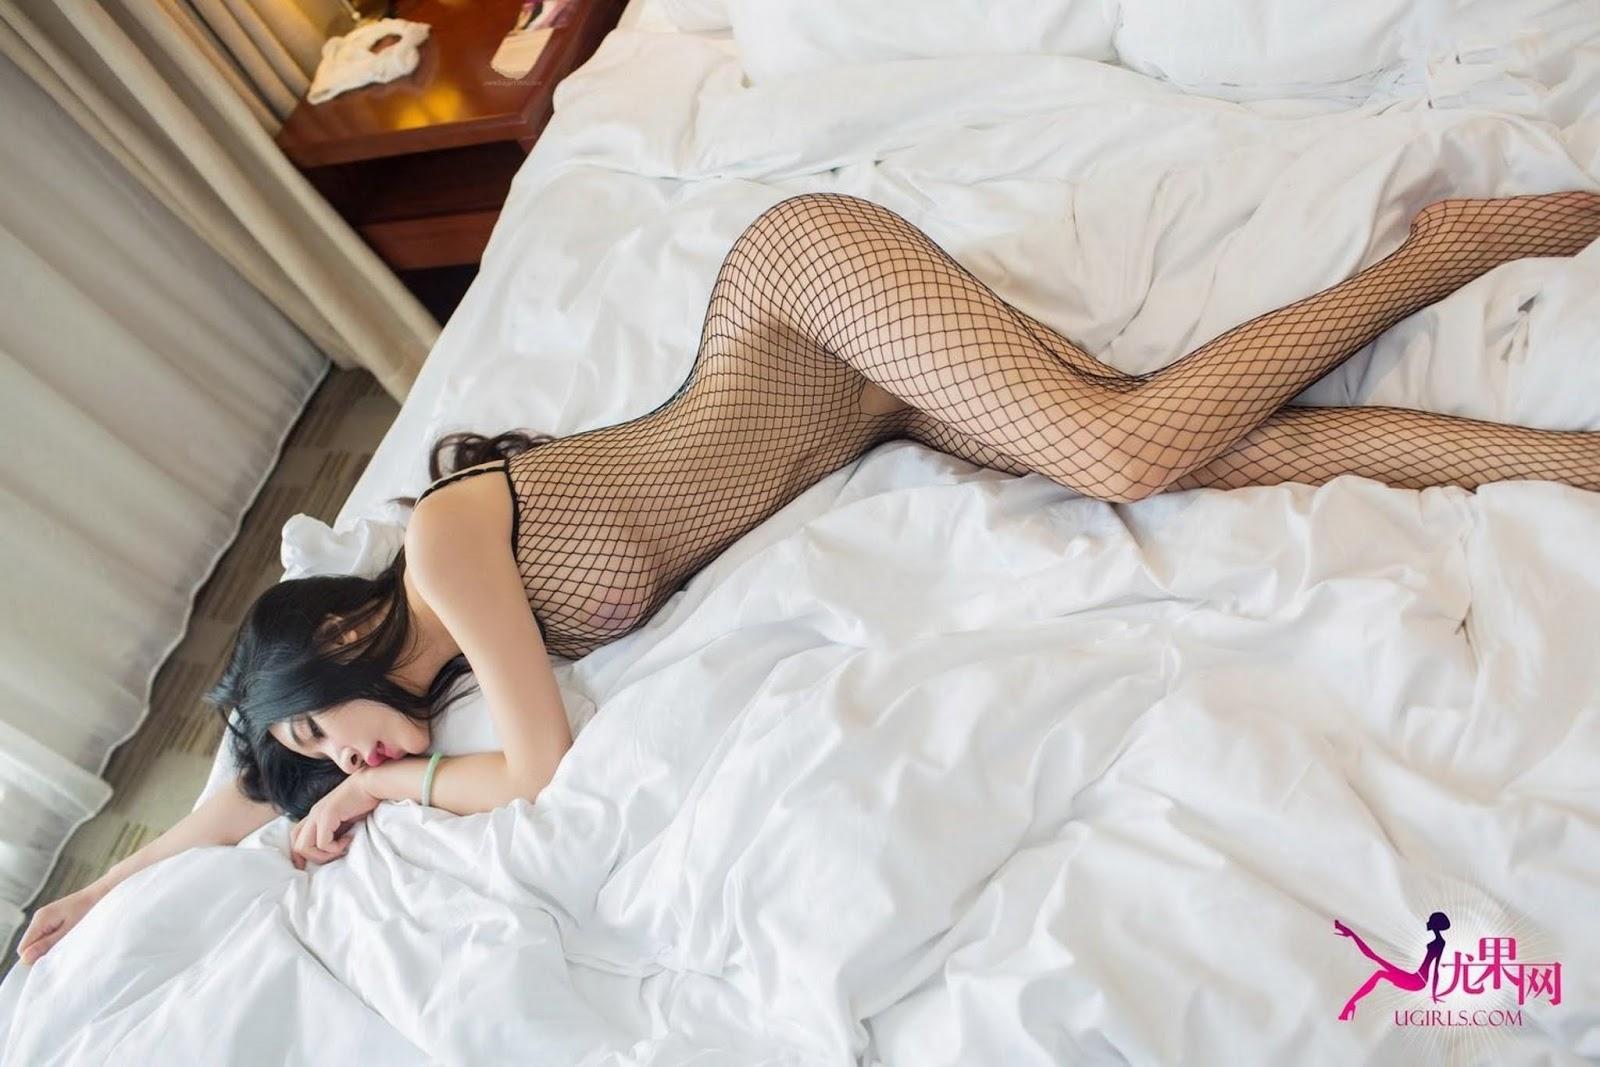 25 - Sexy Photo UGIRLS NO.103 Nude Girl